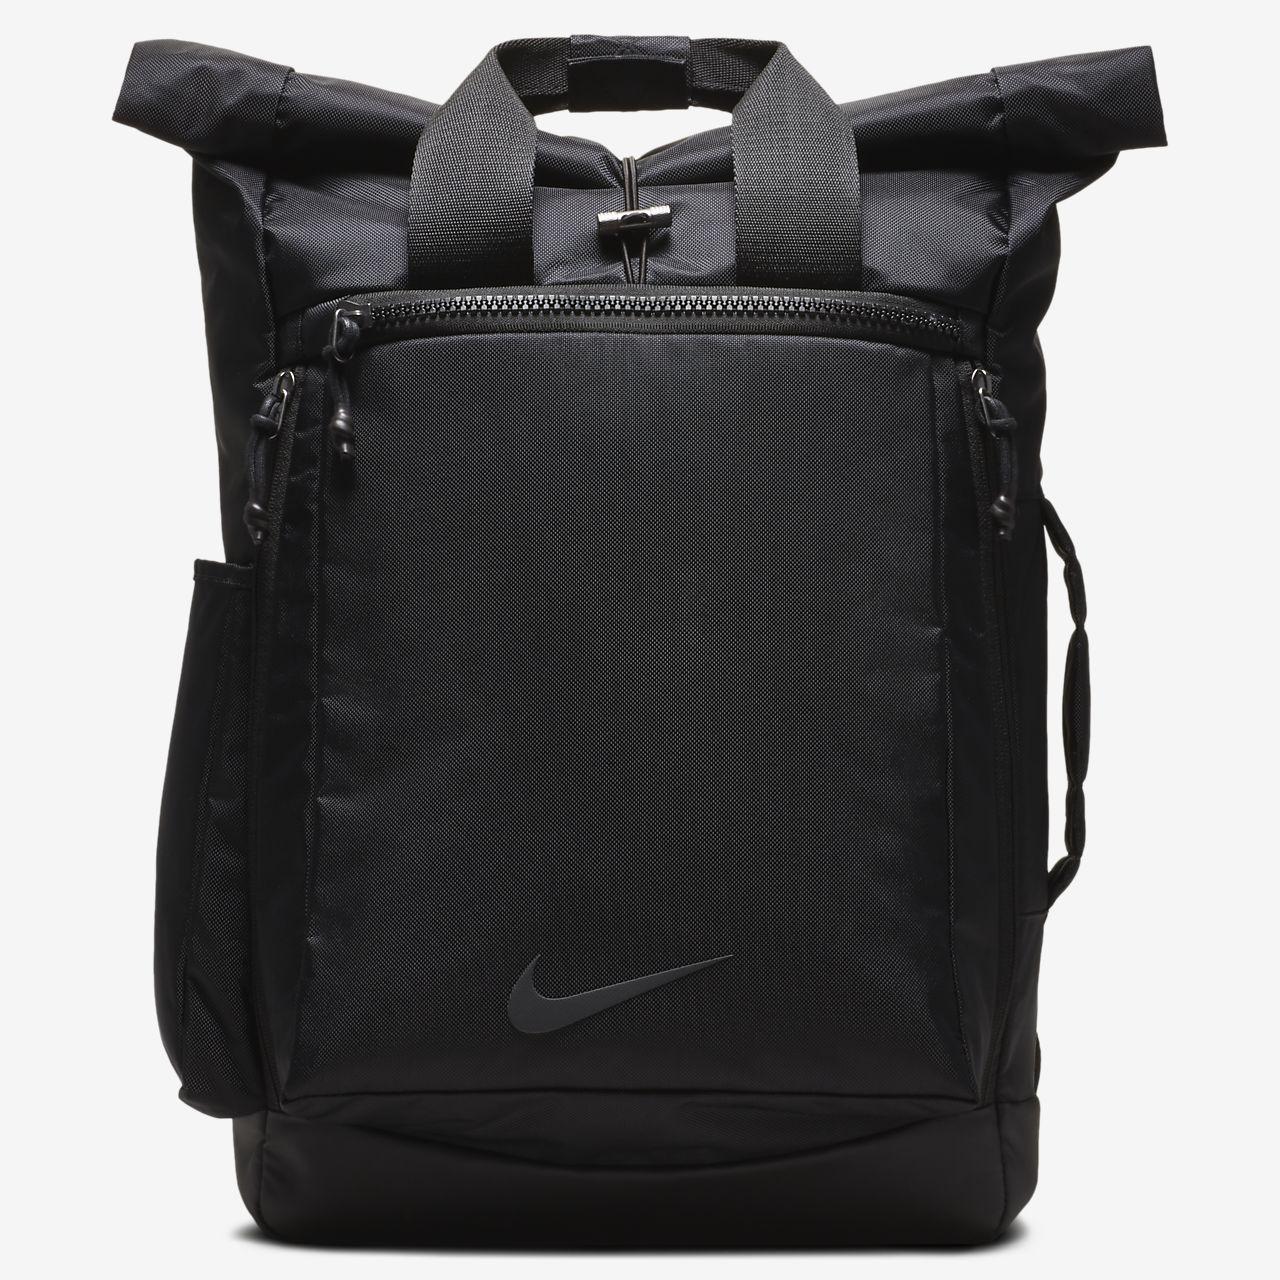 Mochila de treino Nike Vapor Energy 2.0